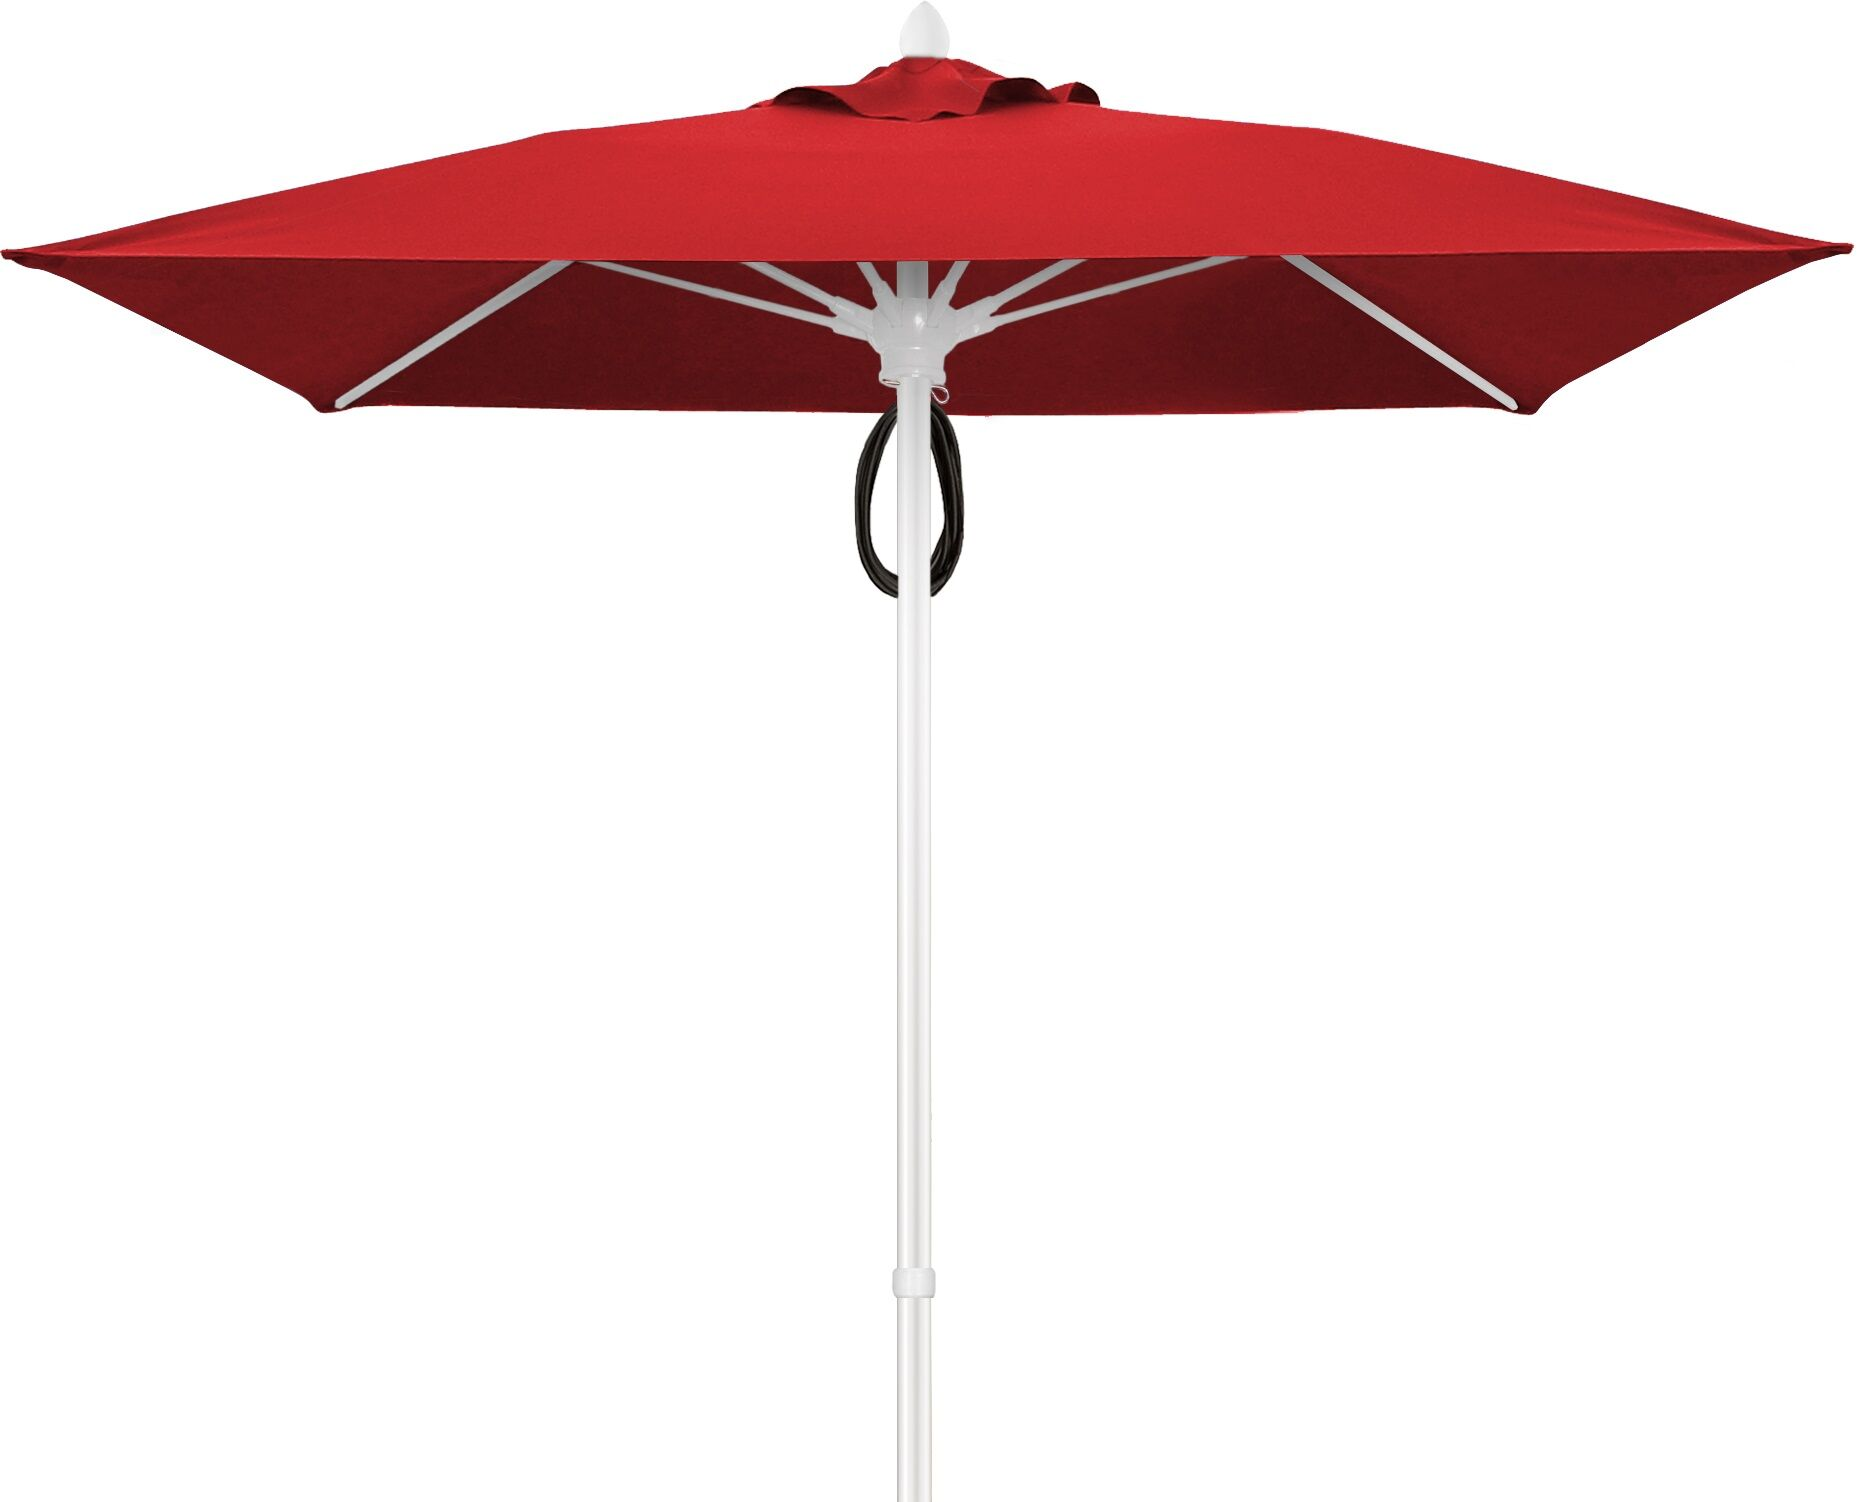 Prestige 7.5' Square Market Umbrella Frame Finish: White, Fabric: Jockey Red